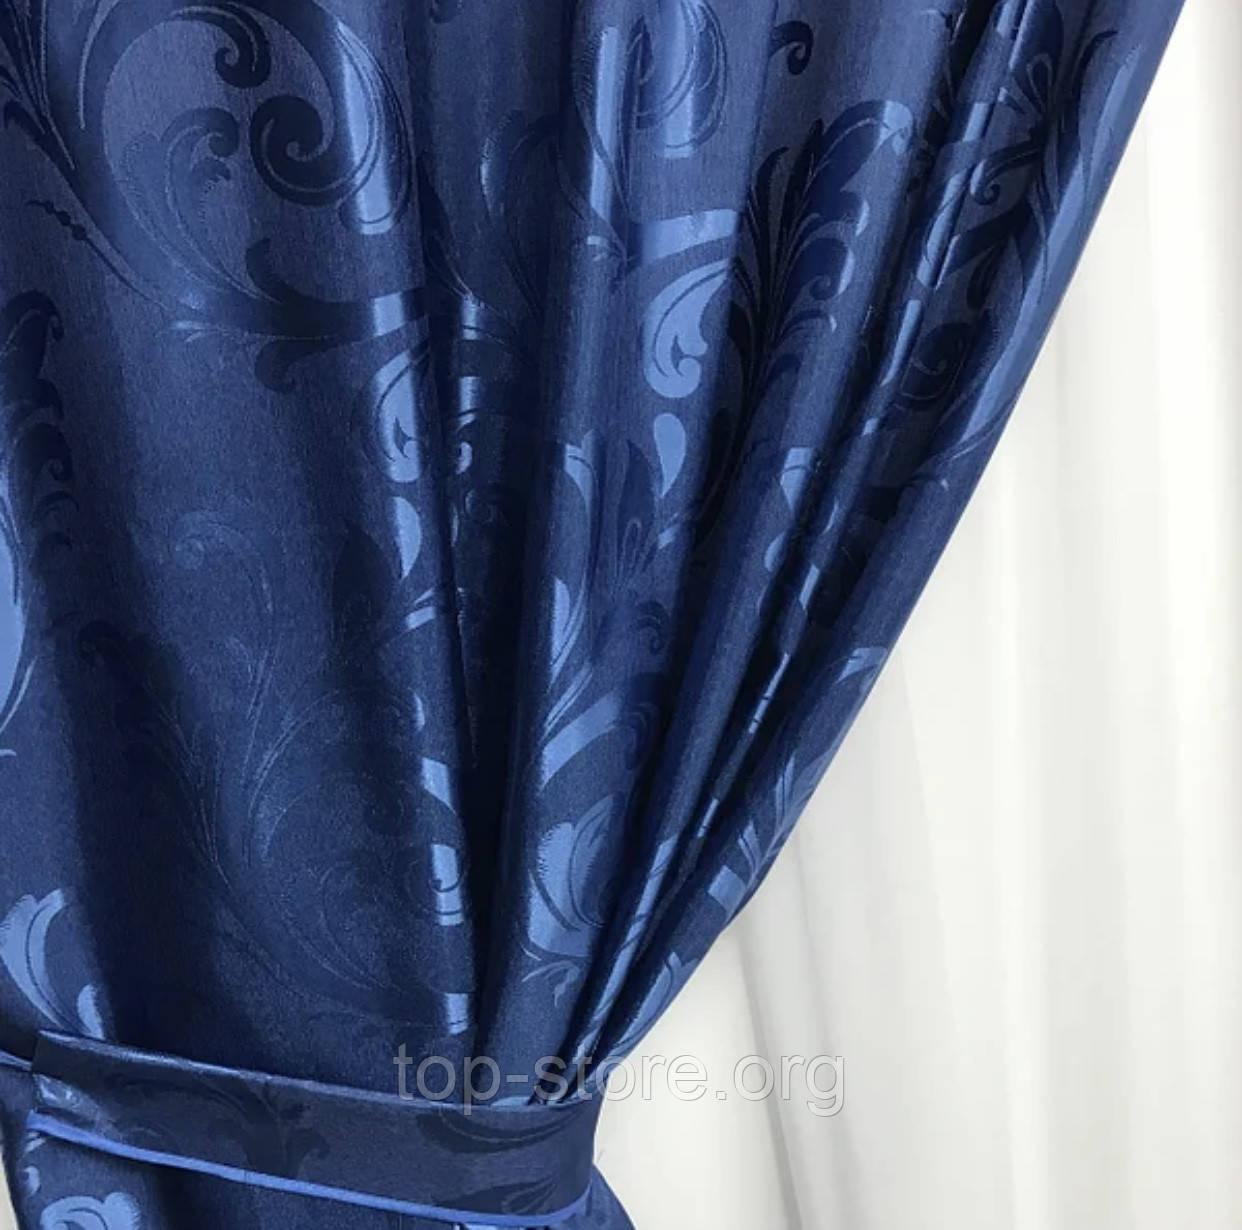 Комплект жаккардовых шторы Жаккардовые шторы с подхватами Шторы 150х270 Цвет Синий